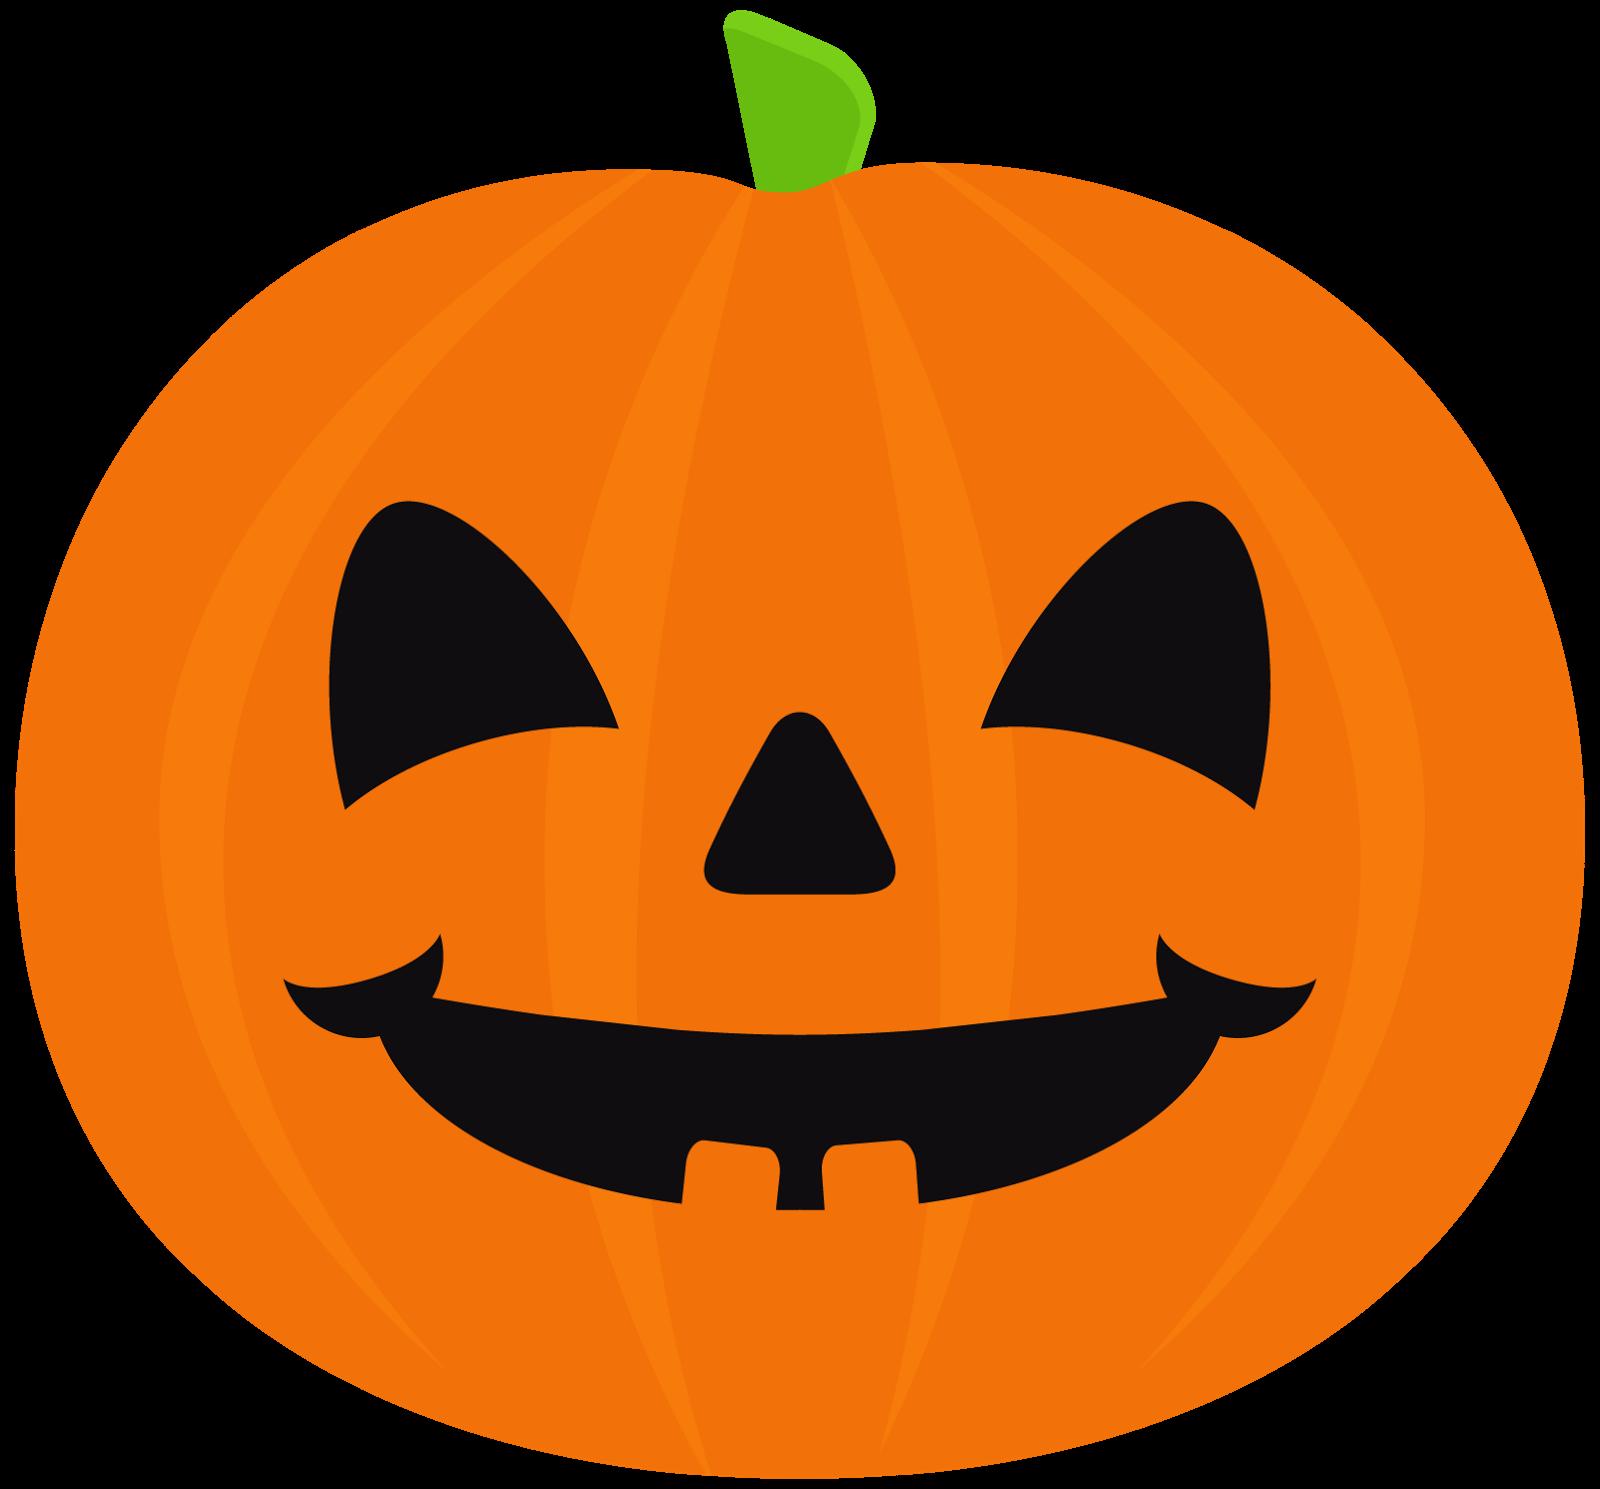 halloween pumpkin clipart oh my fiesta  in english pumpkin clip art images pumpkin clip art transparent